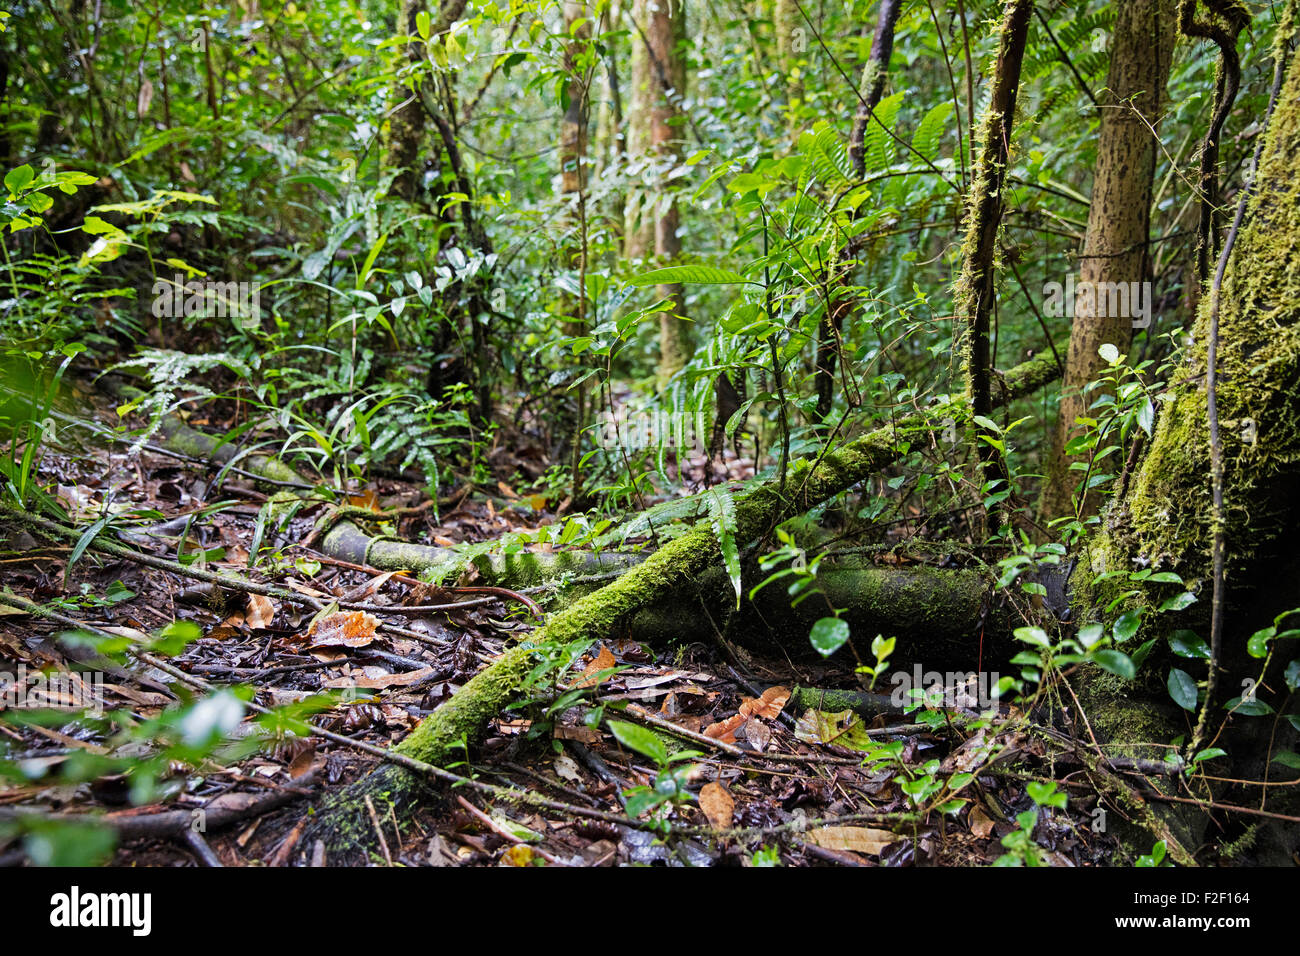 Üppige Vegetation im tropischen Regenwald von Ranomafana Nationalpark, Haute Matsiatra, Madagaskar, Südostafrika Stockbild